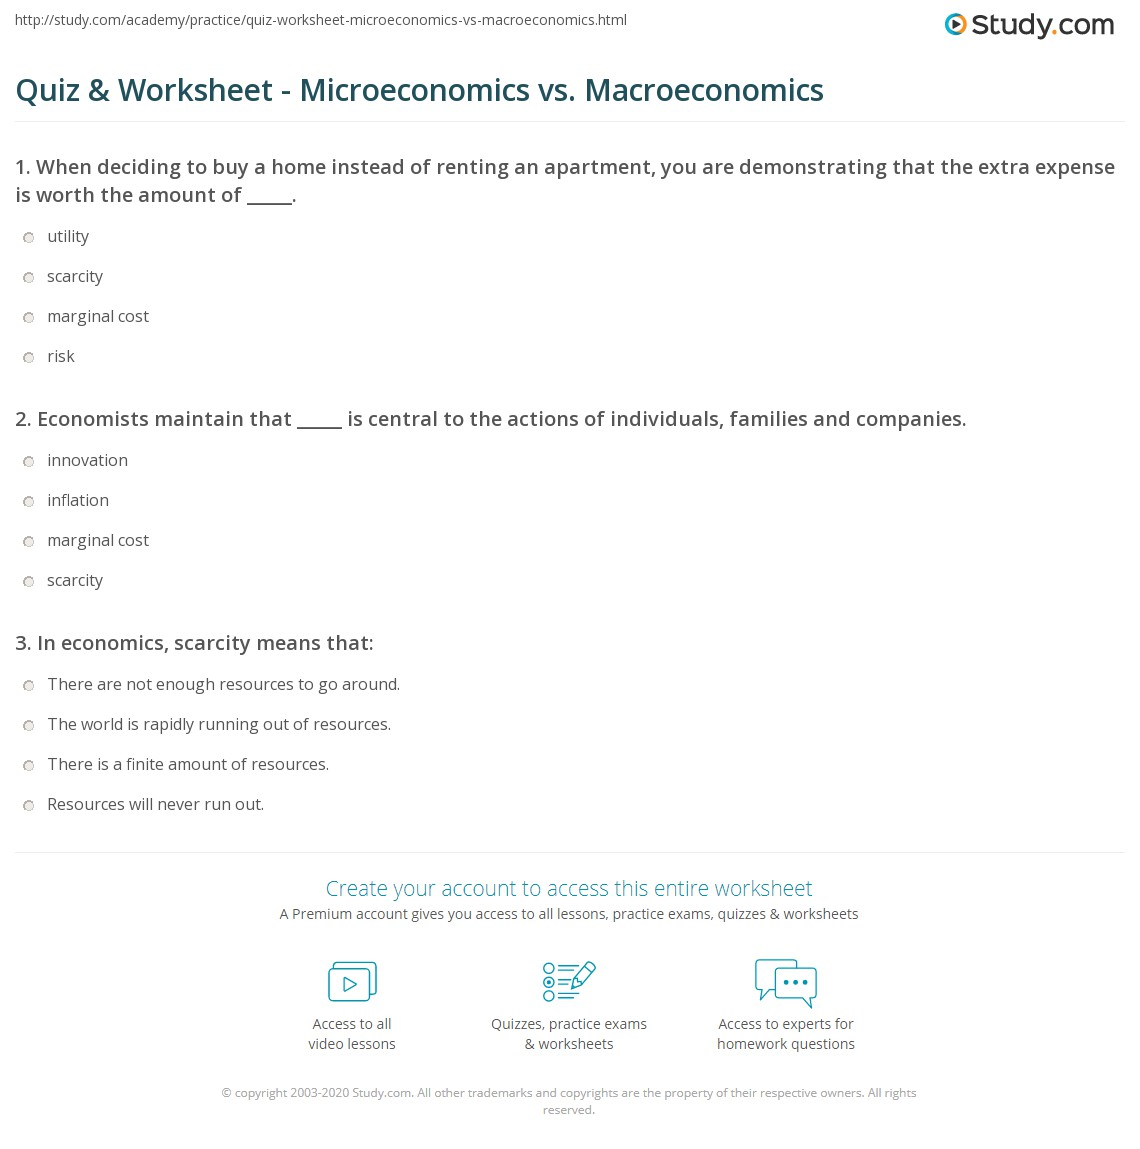 how are microeconomics and macroeconomics related